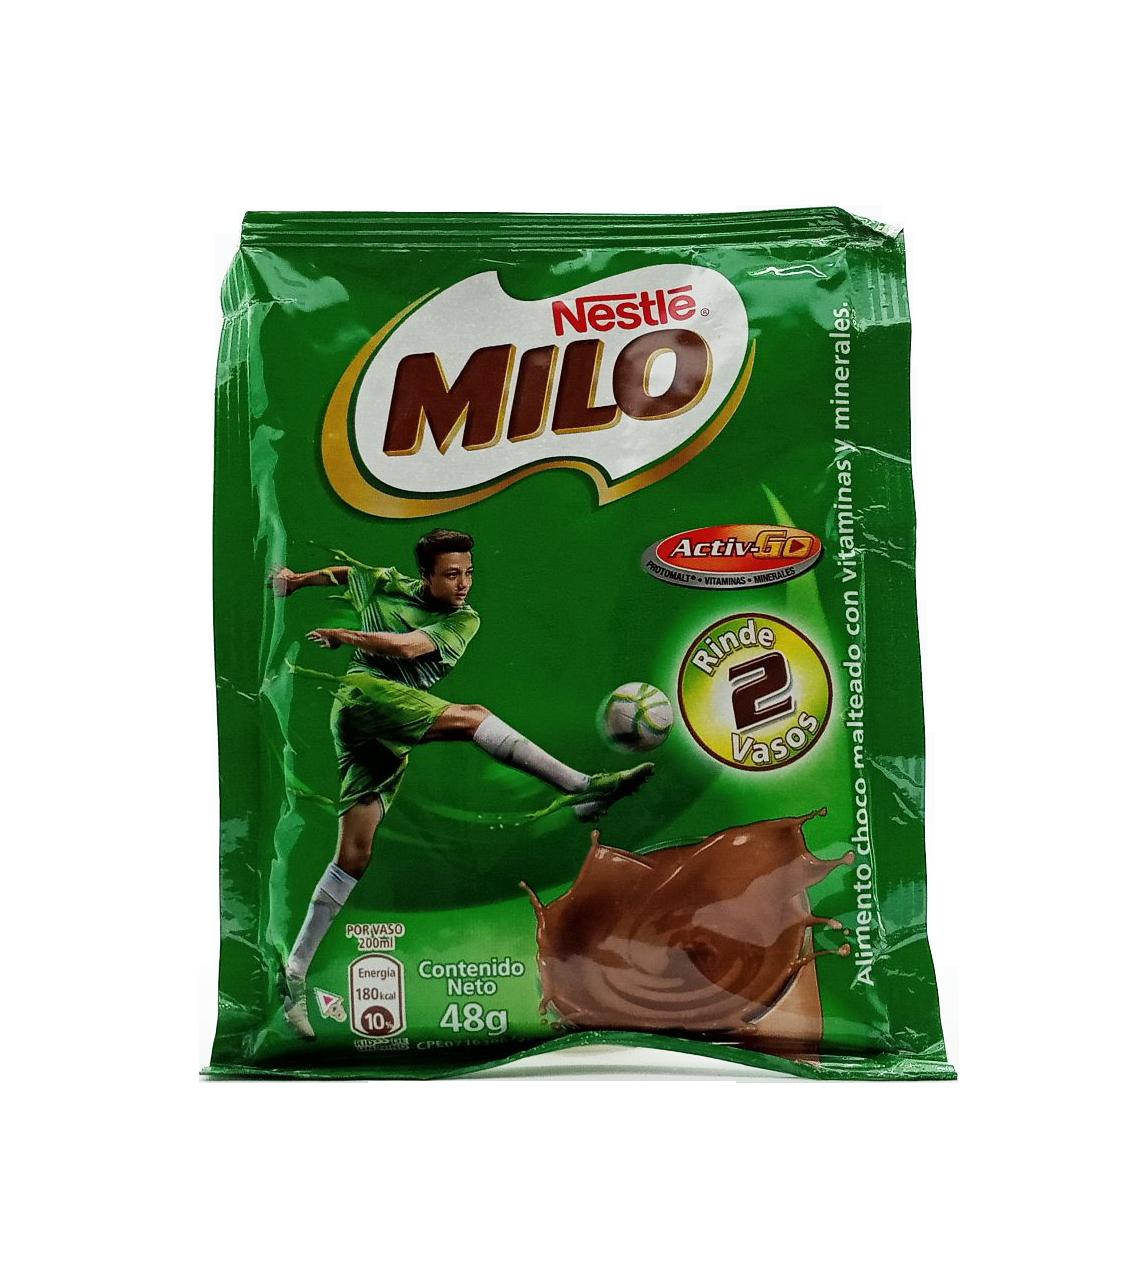 MILO ACTIV GO ALIMENTO CHOCO MALT 48GR 12329932